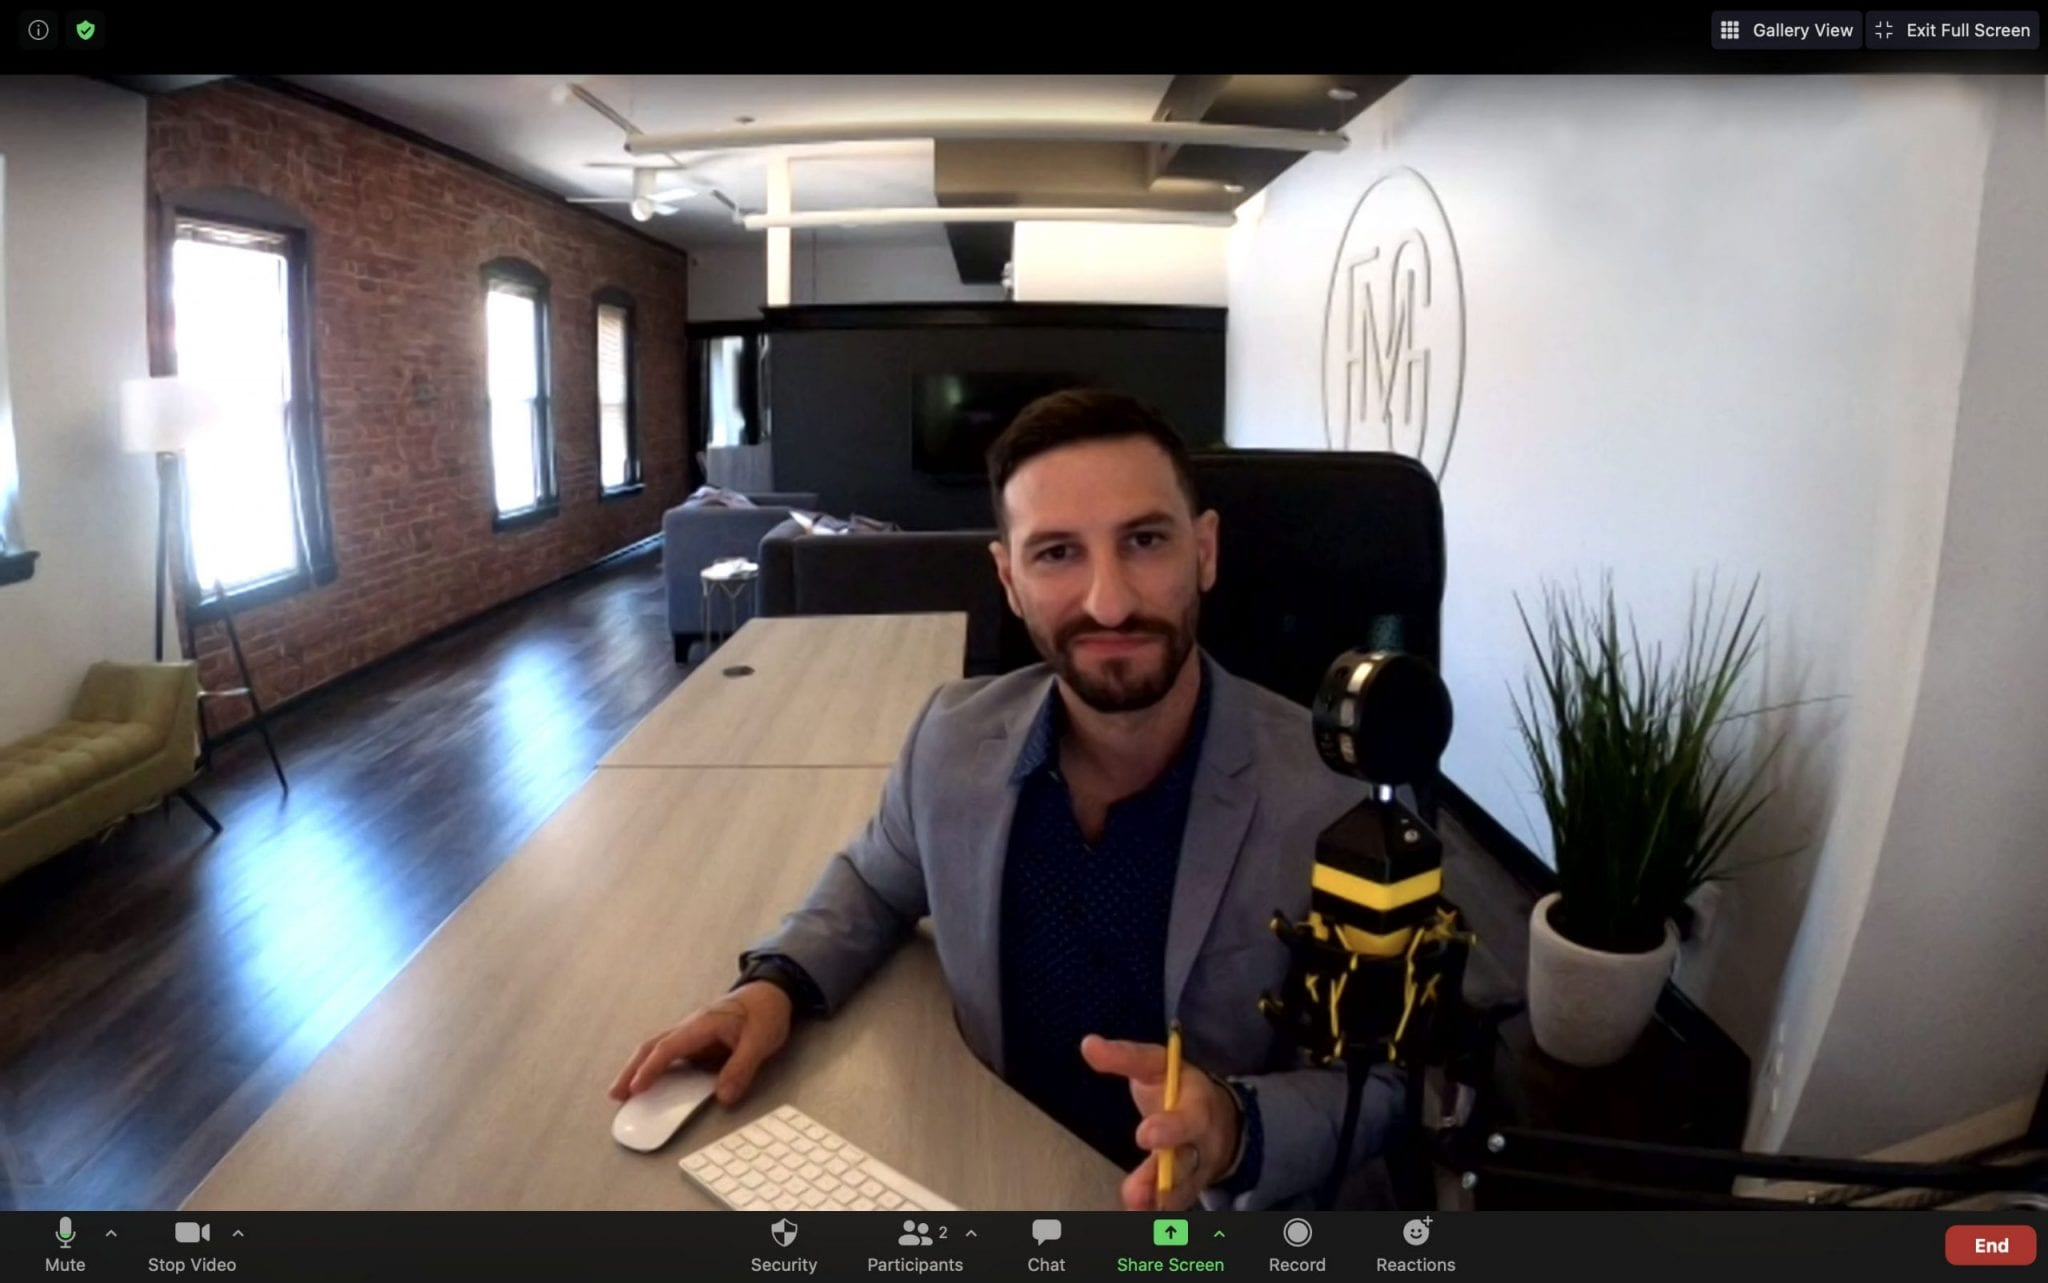 Bryan Festa holding a virtual meeting | Elegant Music Group - EMG